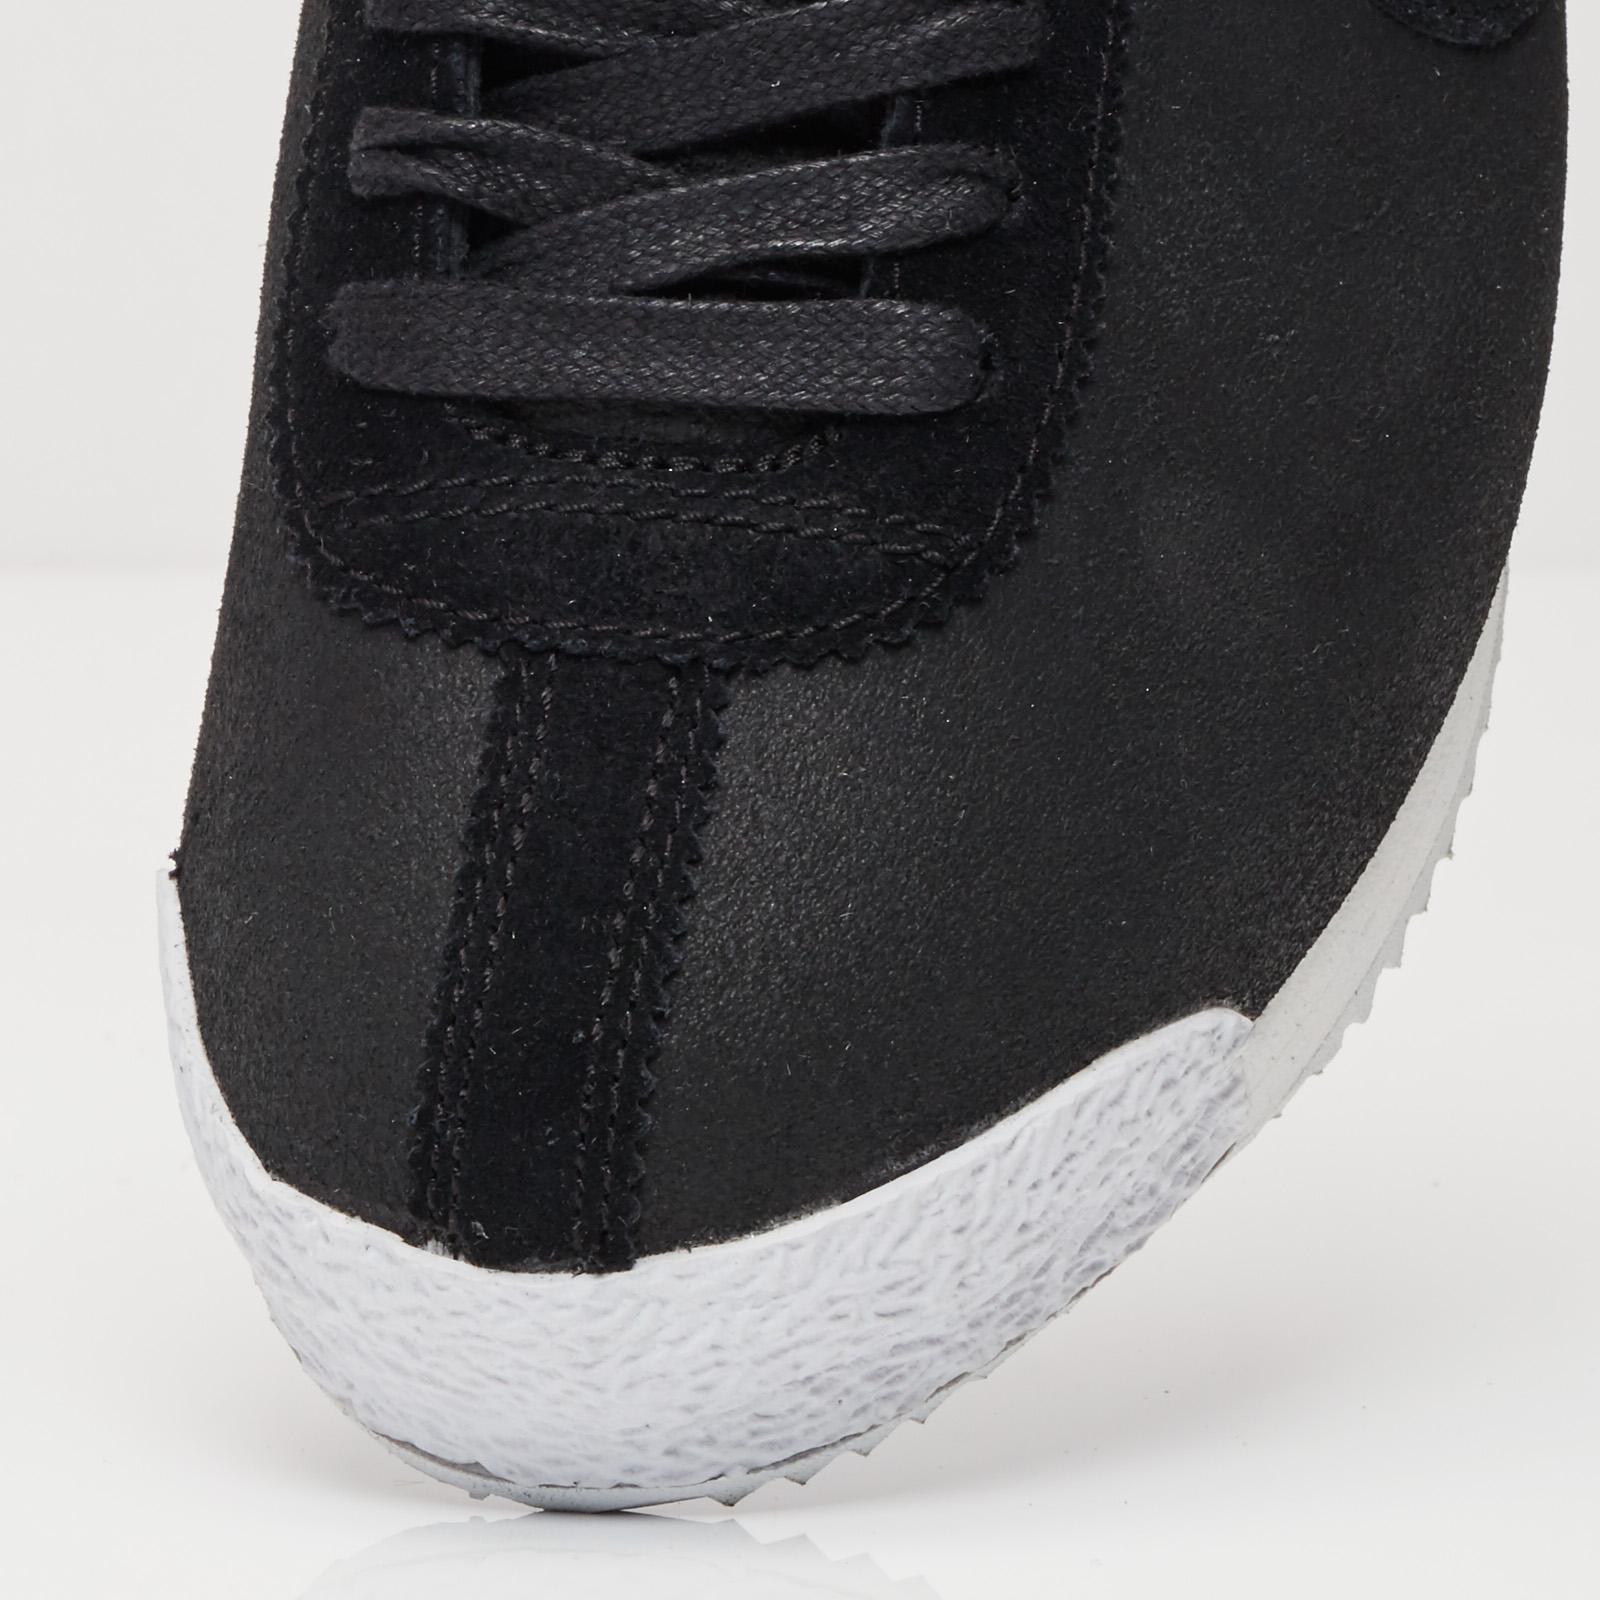 promo code 8bf85 2ba13 ... Nike Cortez 72 ...